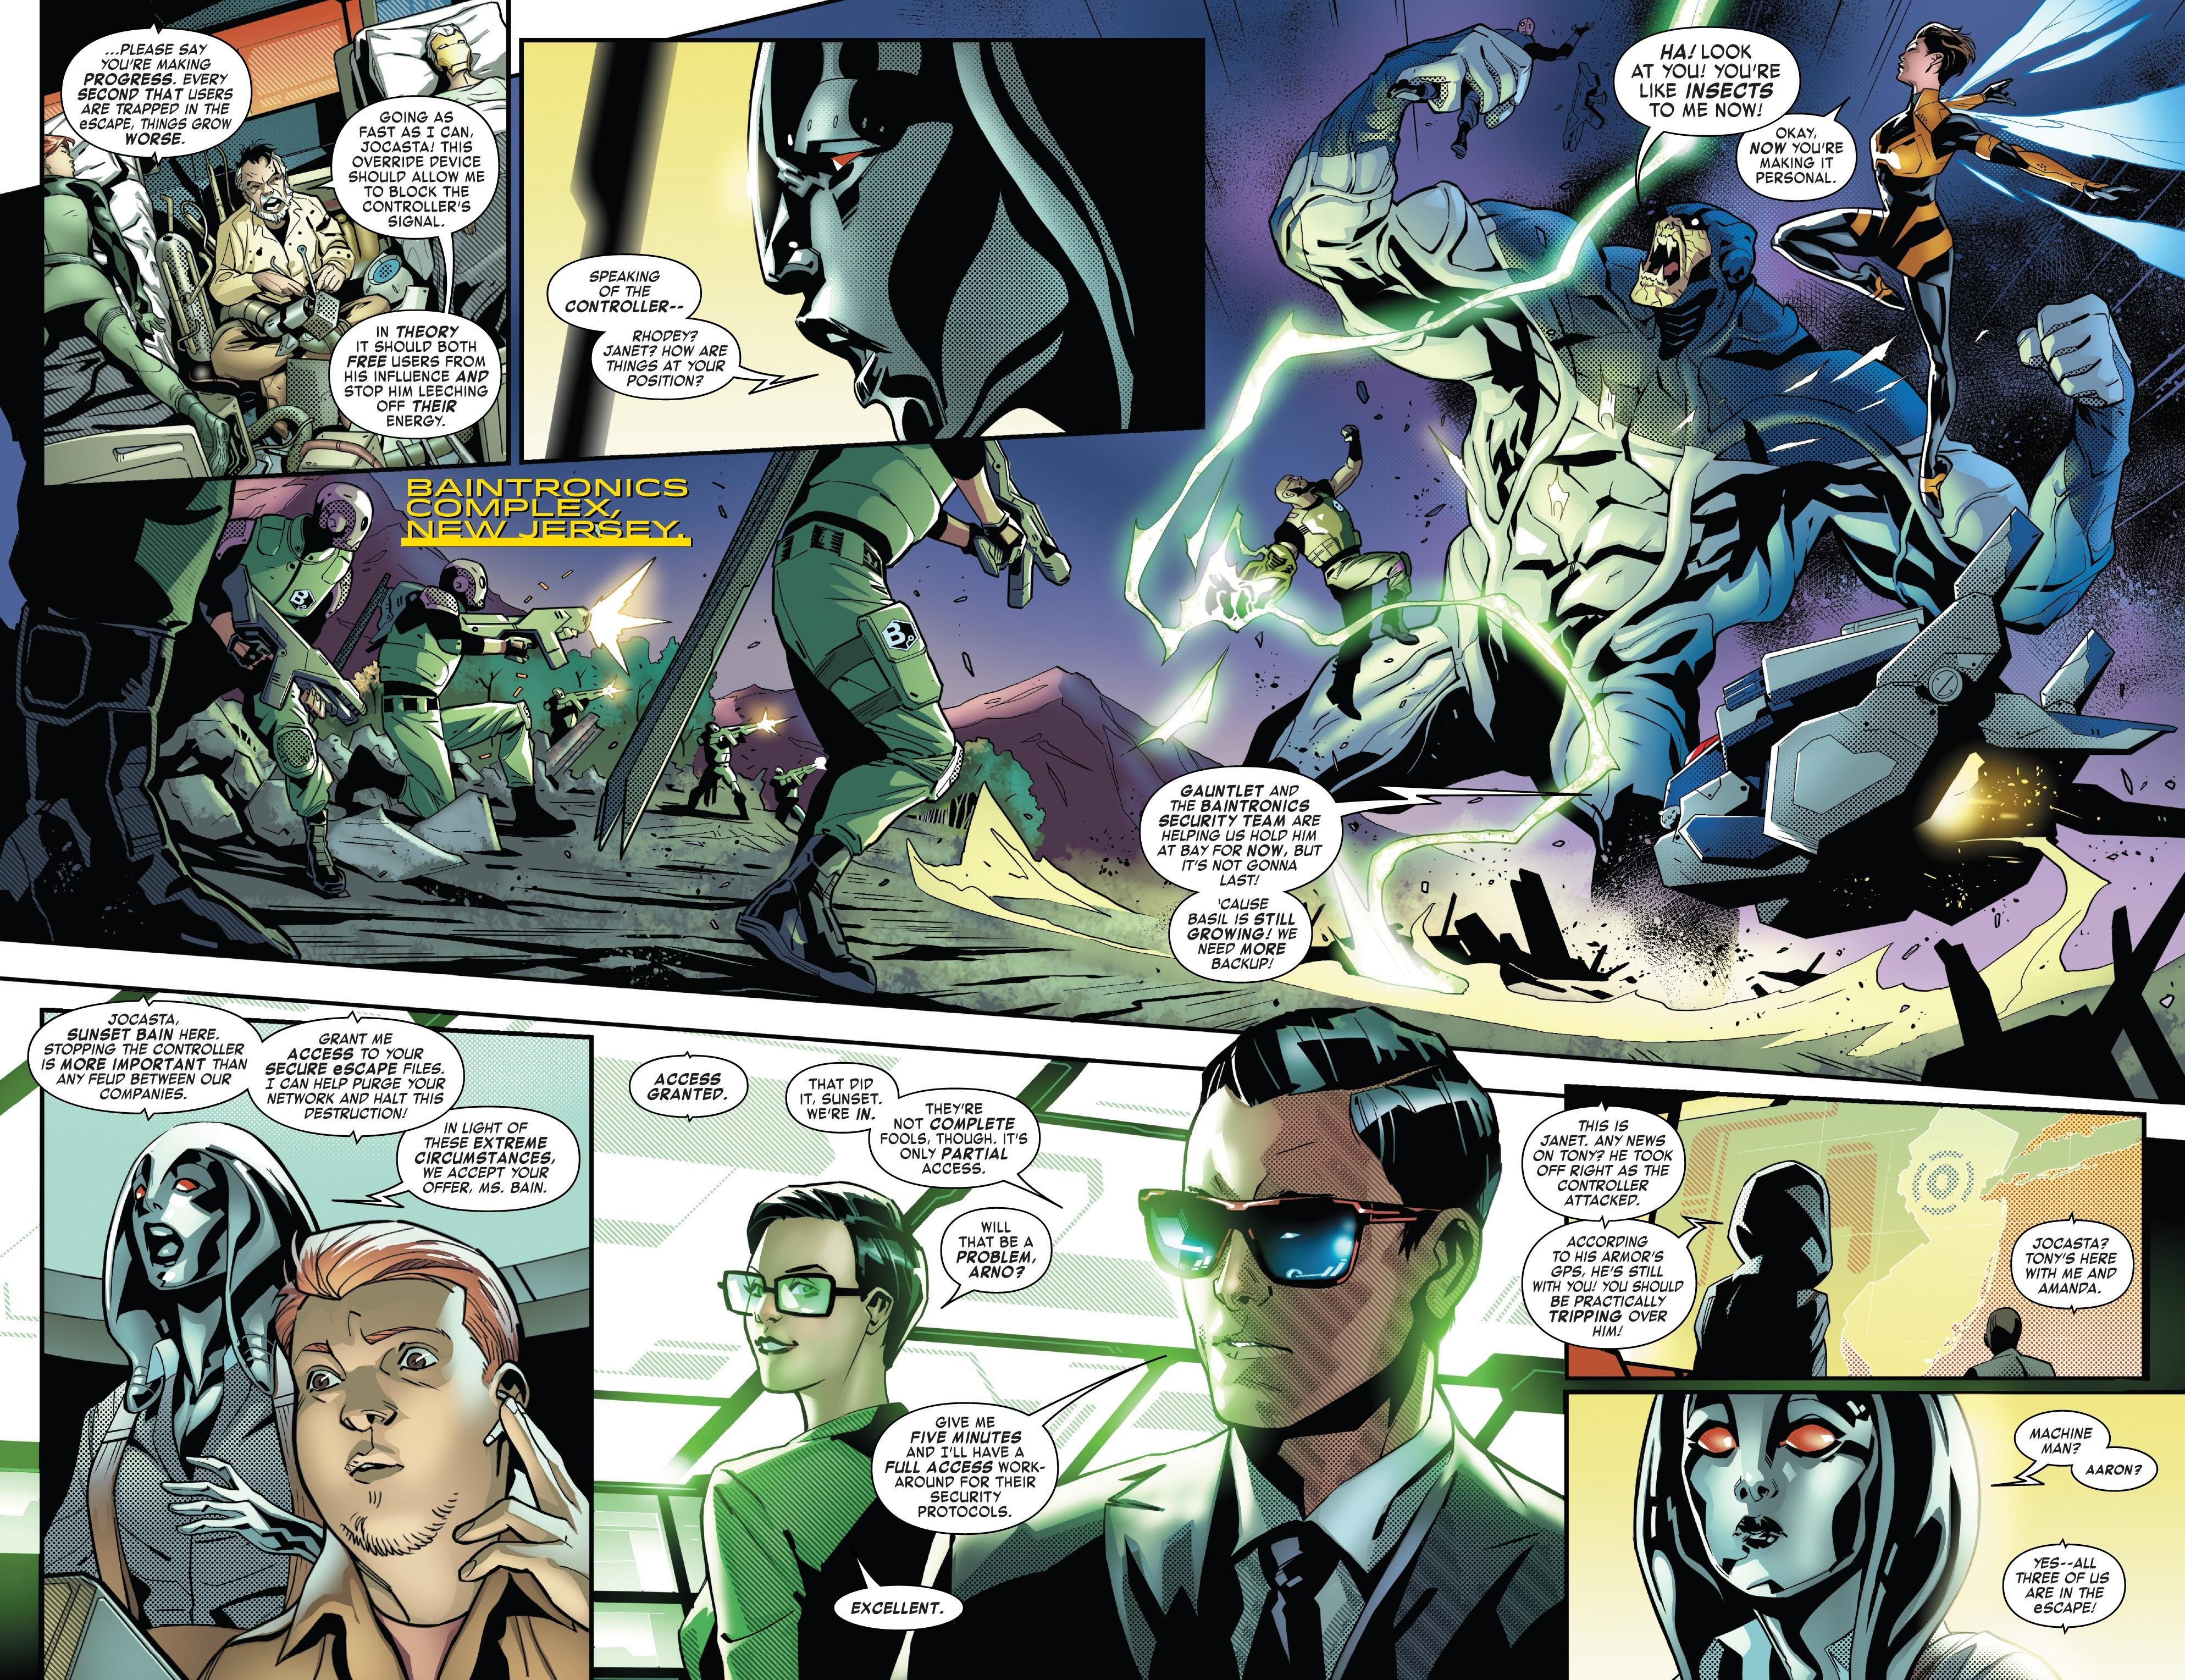 Read online Tony Stark: Iron Man comic -  Issue #10 - 5